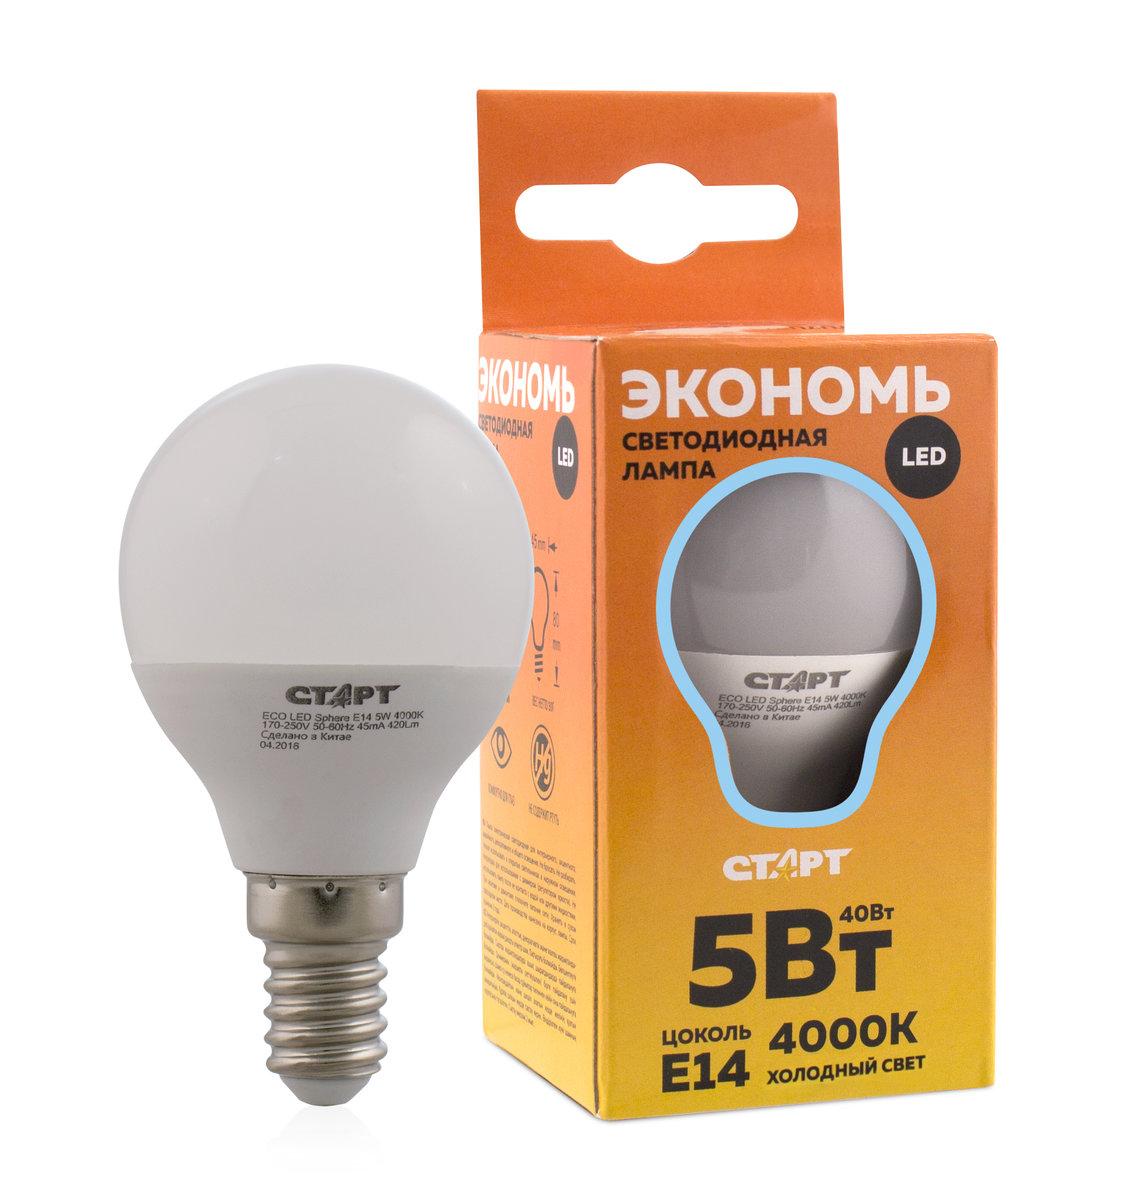 Лампа светодиодная СТАРТ Eco, в форме шарика, холодный свет, цоколь E14, 5W11099Лампа светодиодная СТАРТ Eco, в форме шарика, холодный свет, цоколь E14, 5W